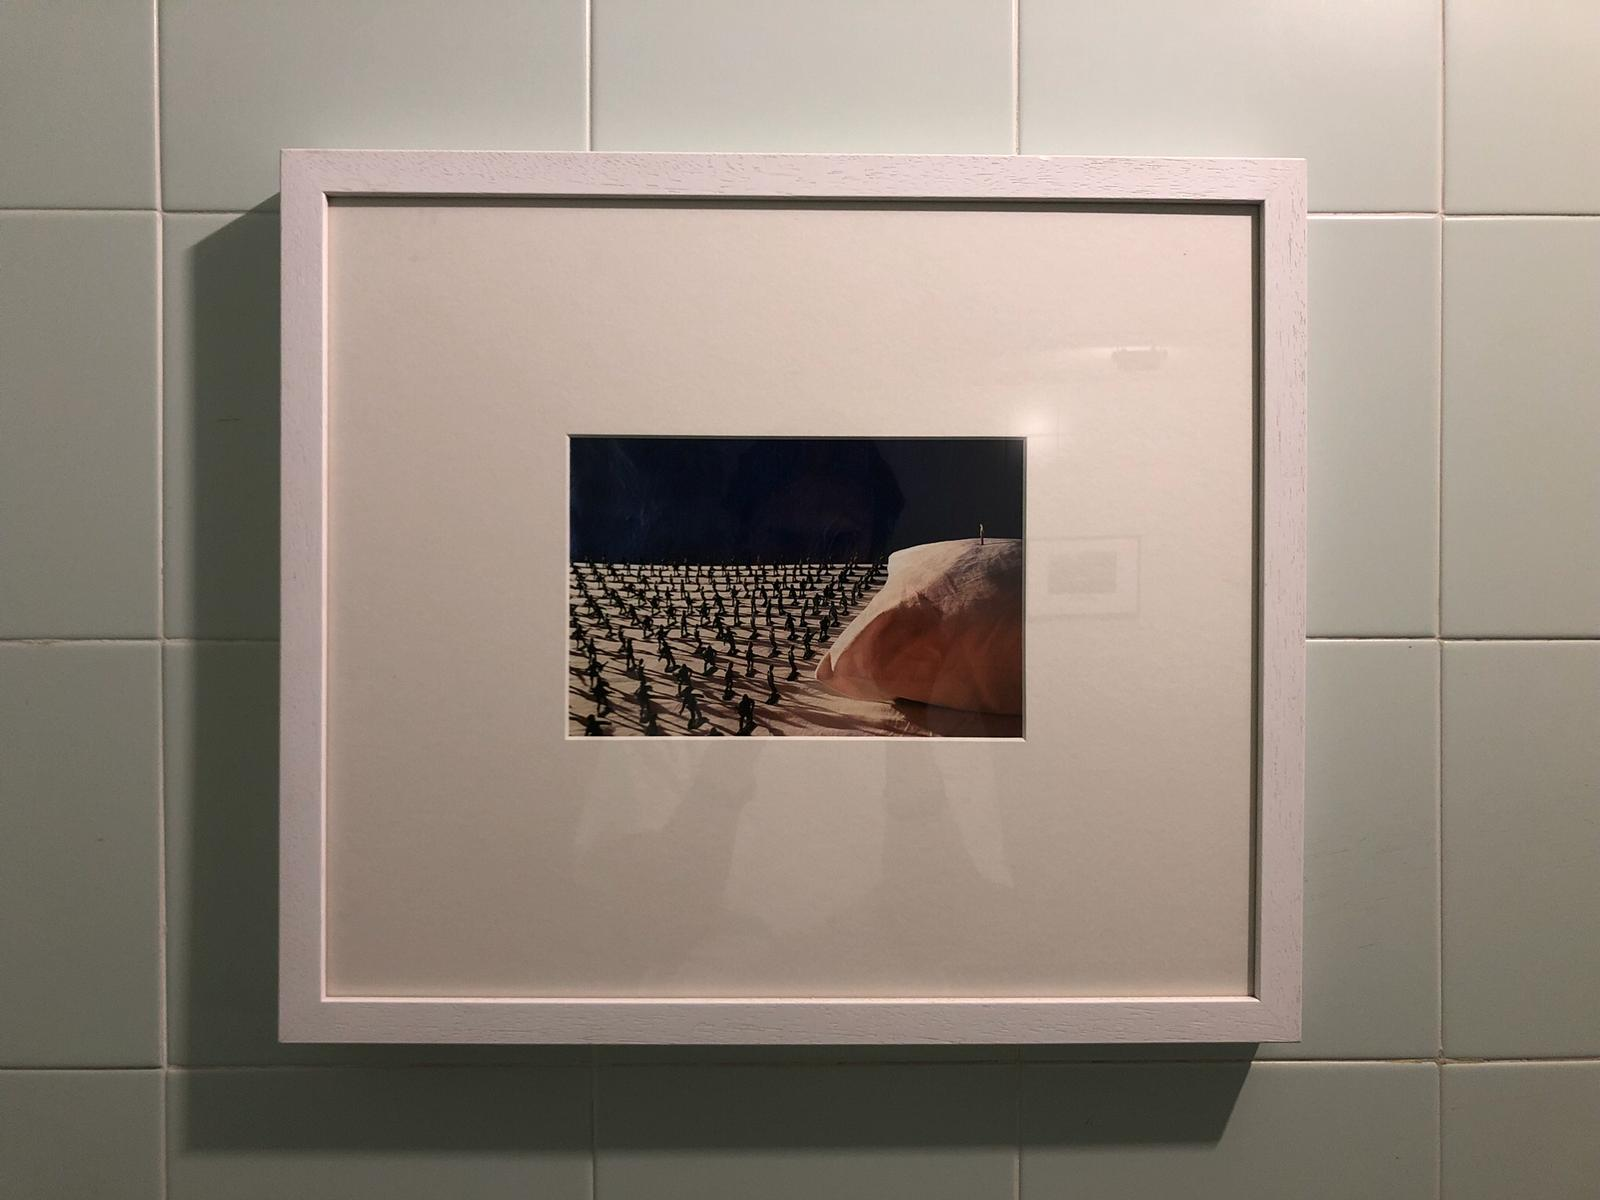 Over My Bed, Fadi Al-Hamwi, Print of the installation, 2013